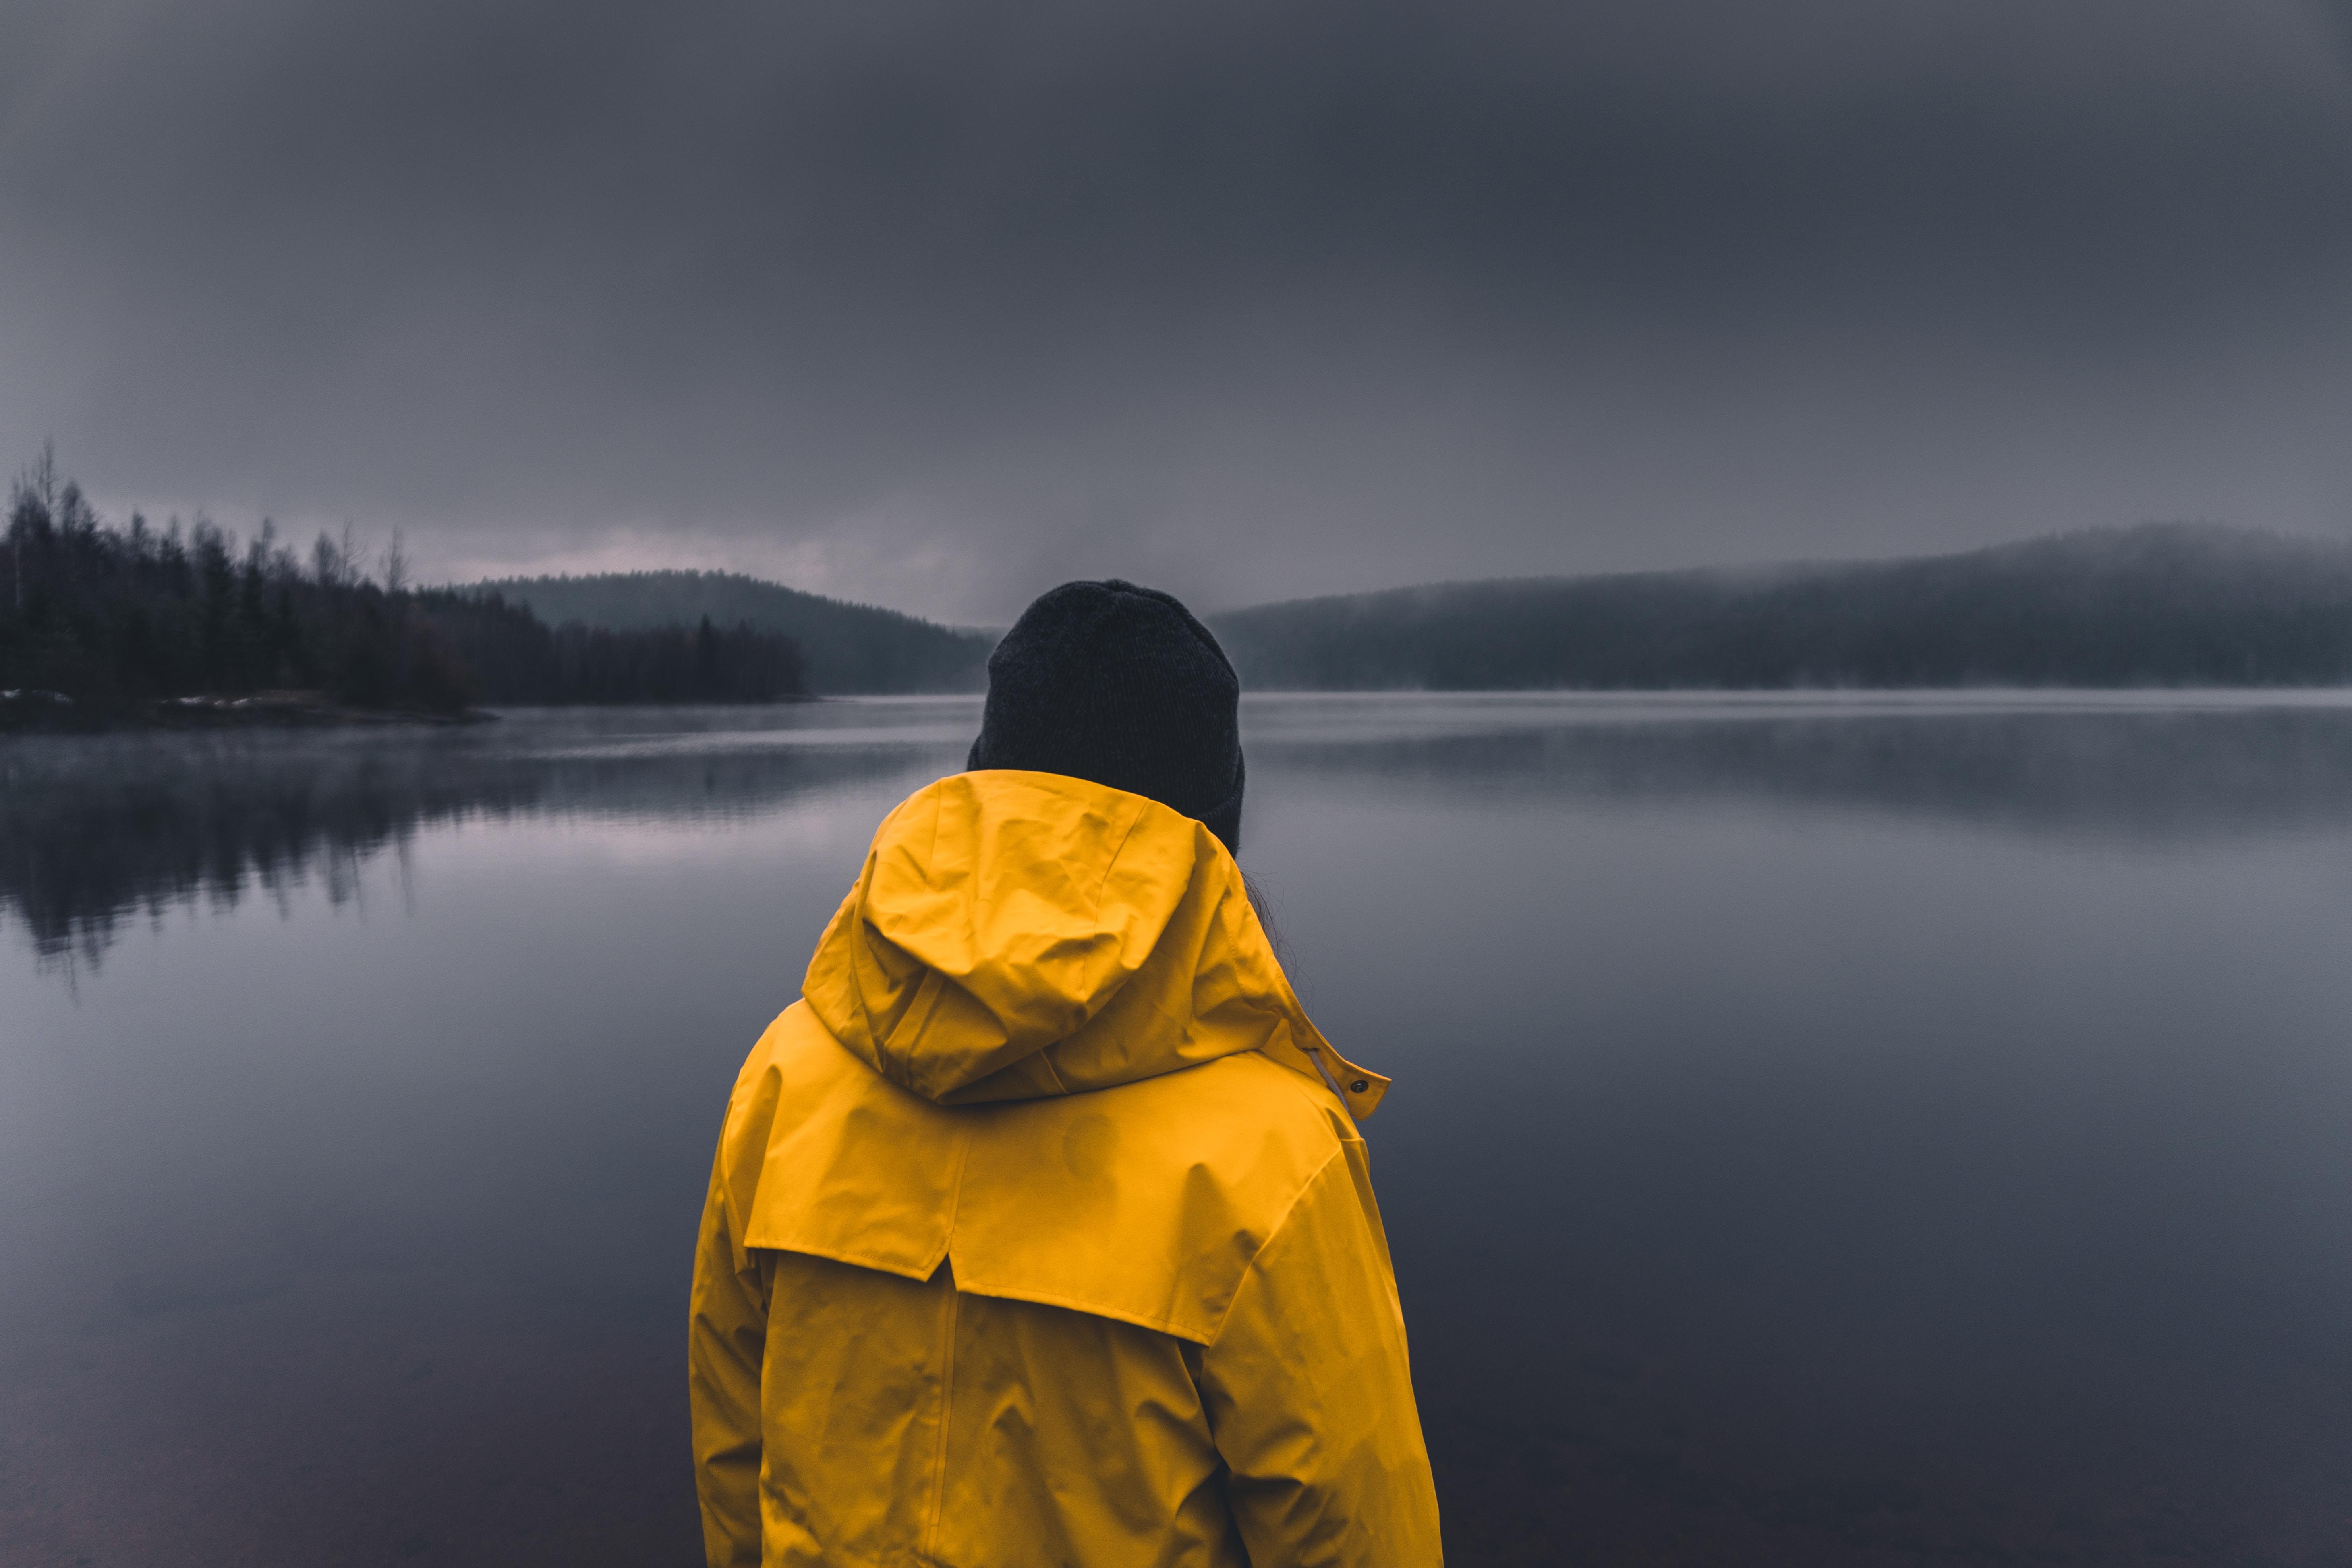 man facing calm body of water under cloudy sky